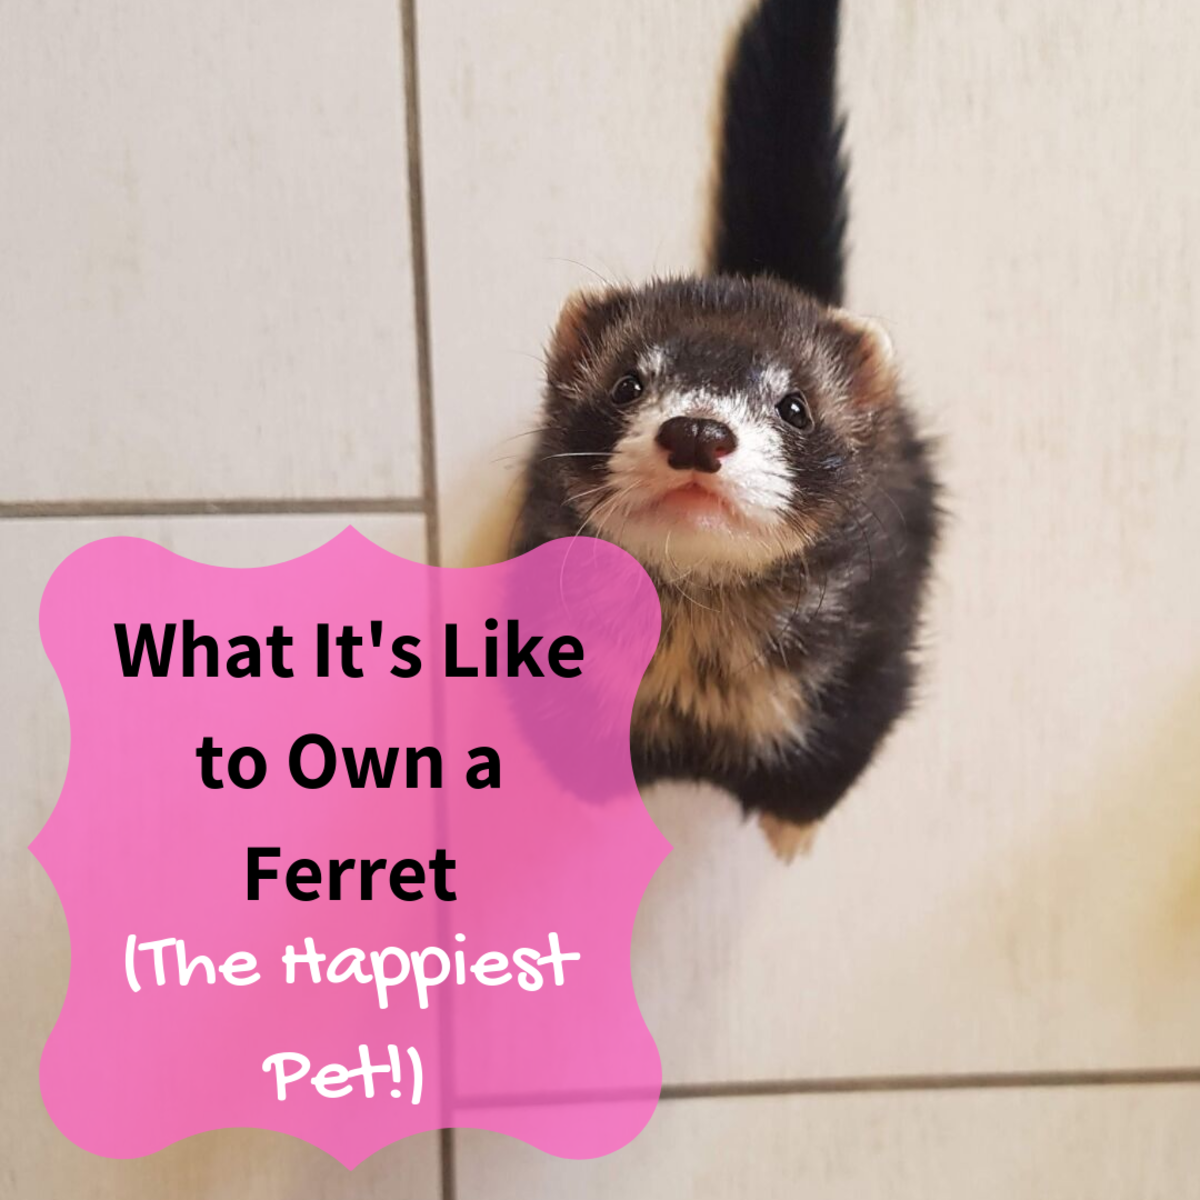 Meet the happy, exuberant ferret: a wonderful pet.